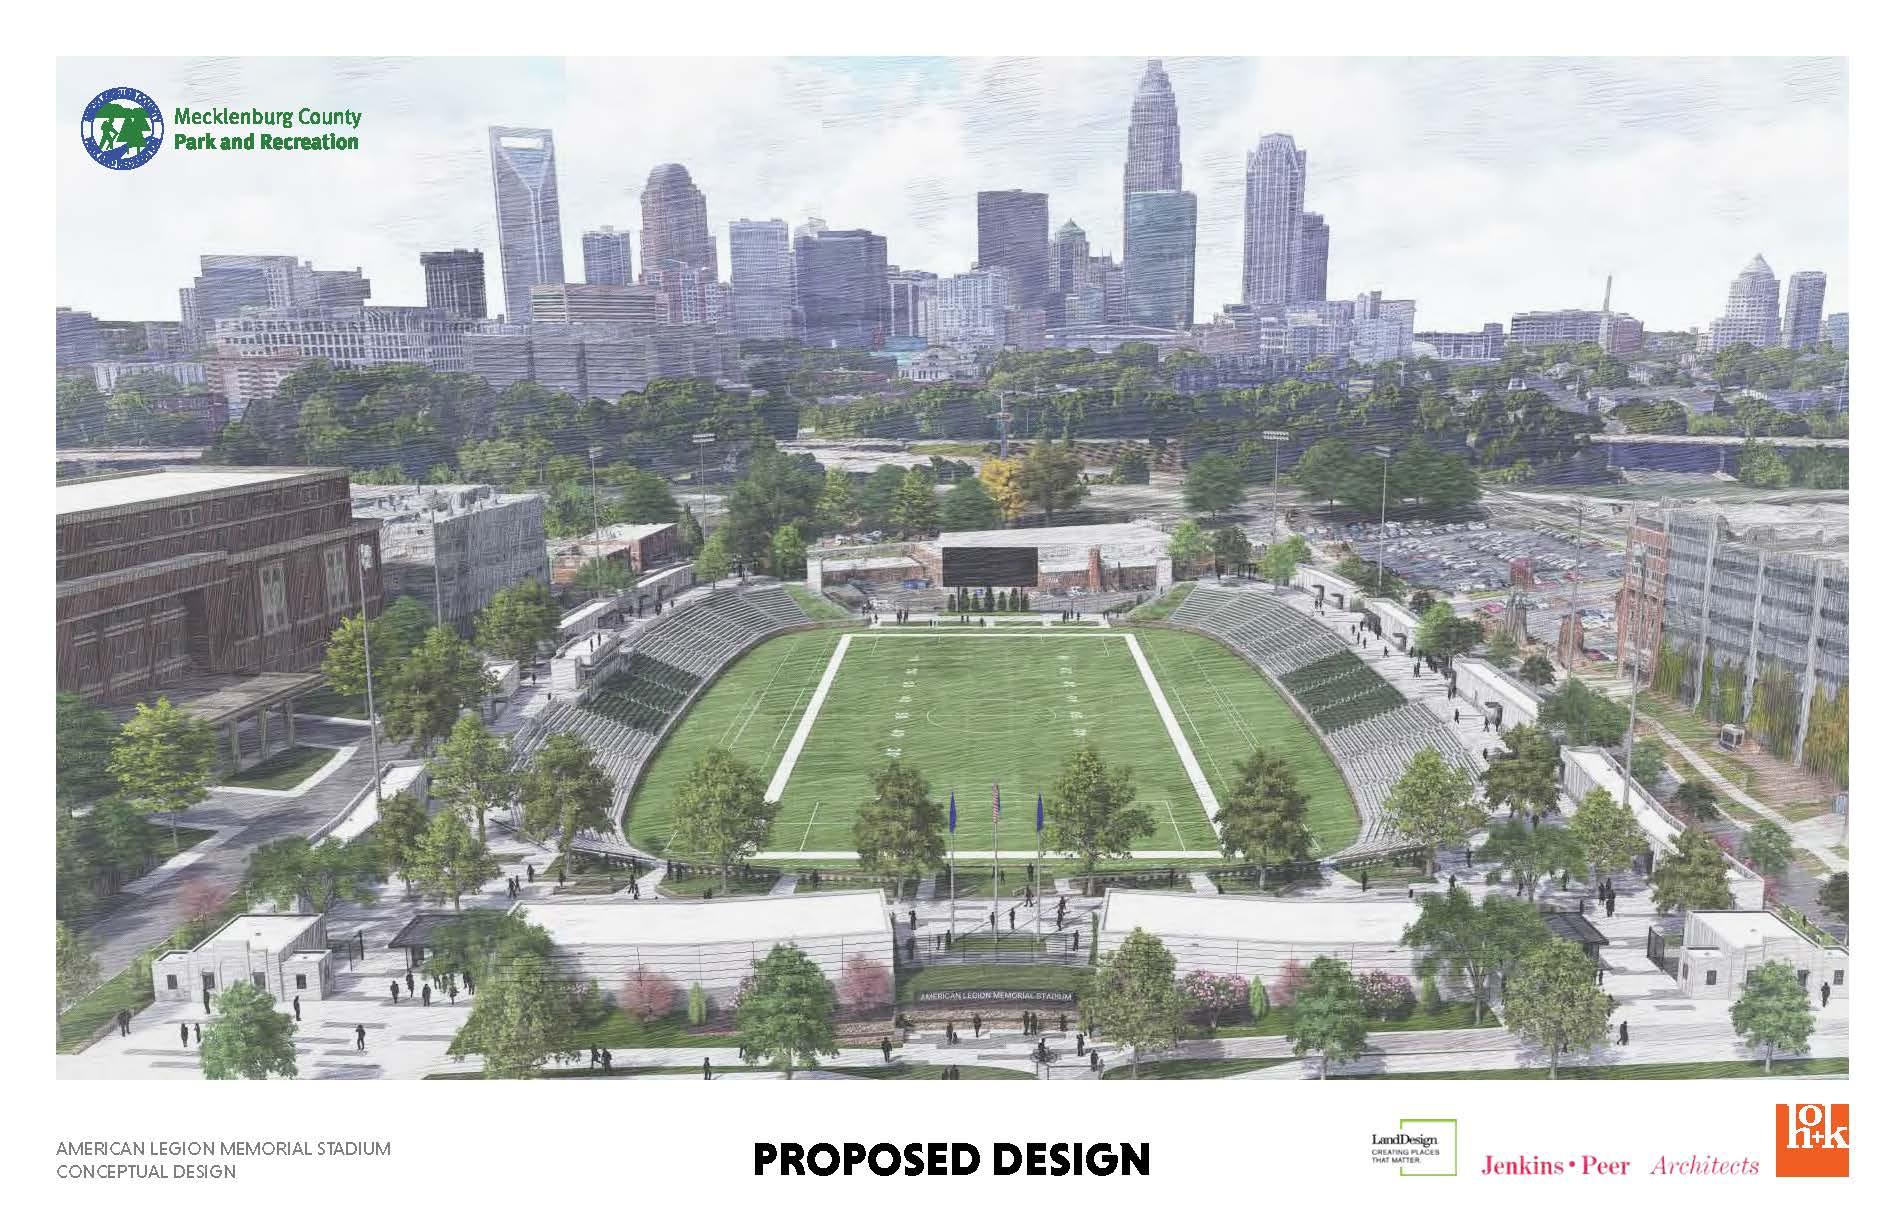 rendering of the American Legion Memorial Stadium in Charlotte NC